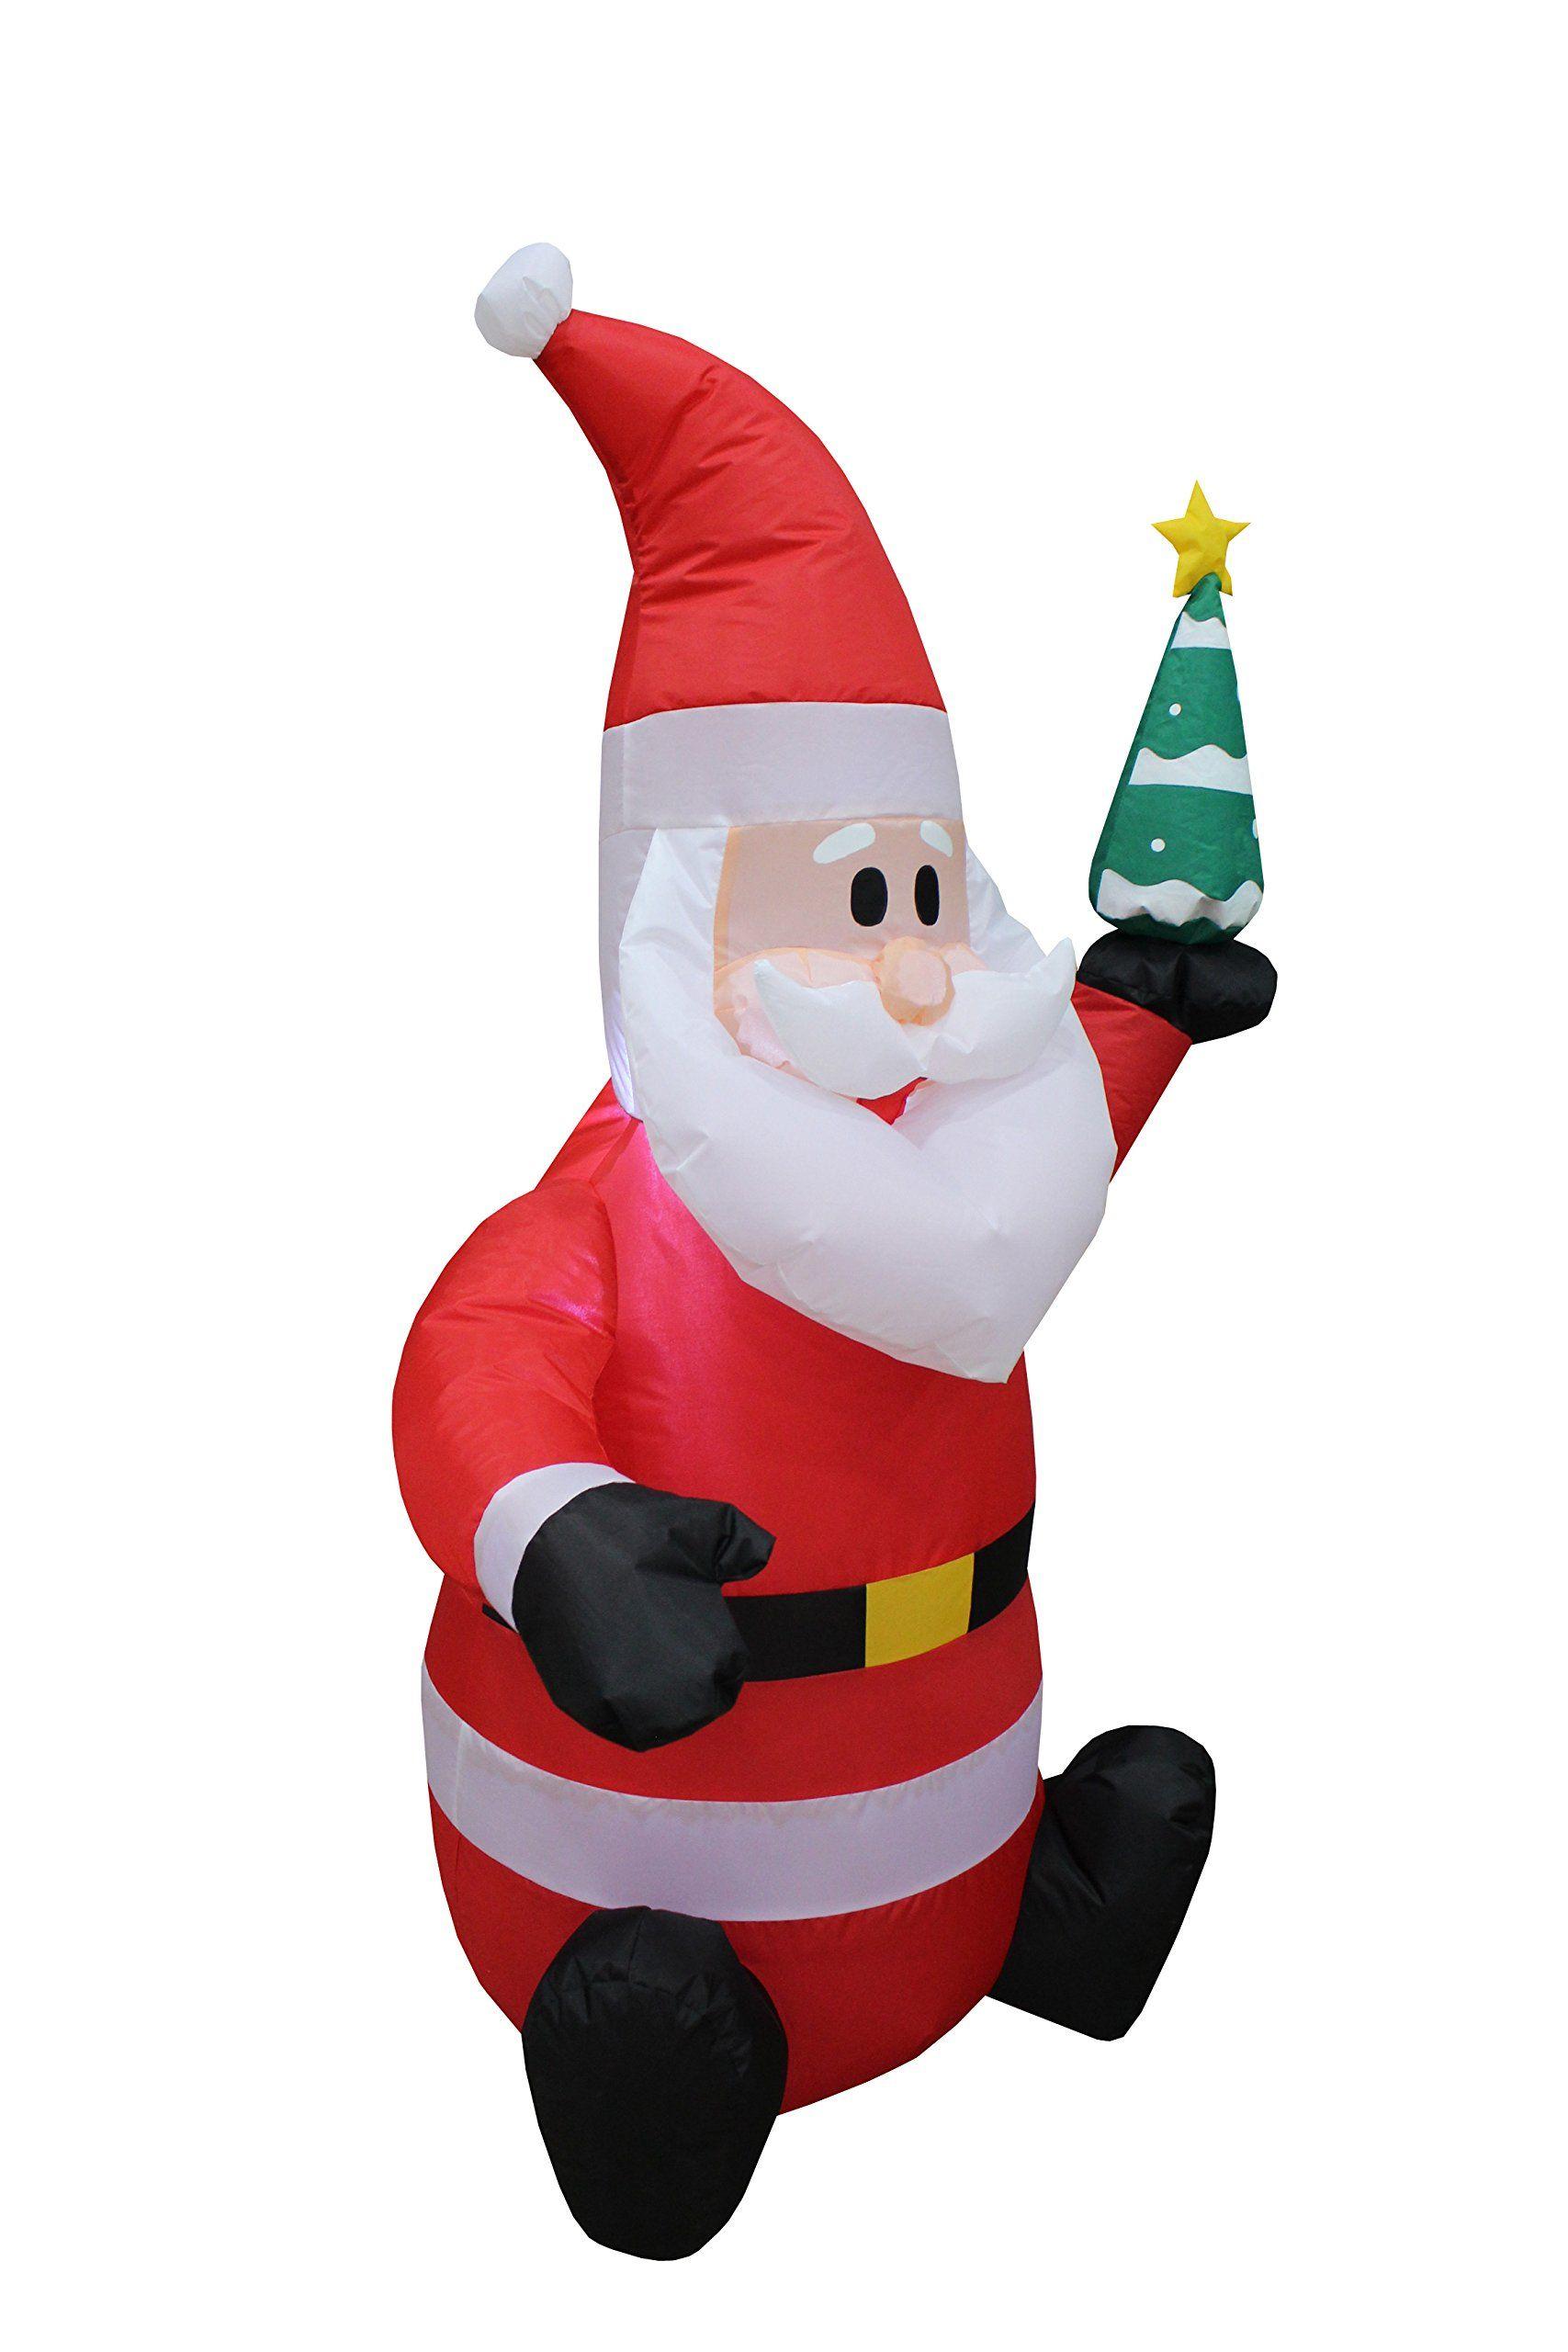 christmasdecor 4 Foot Tall Lighted Christmas Inflatable Santa Claus ...